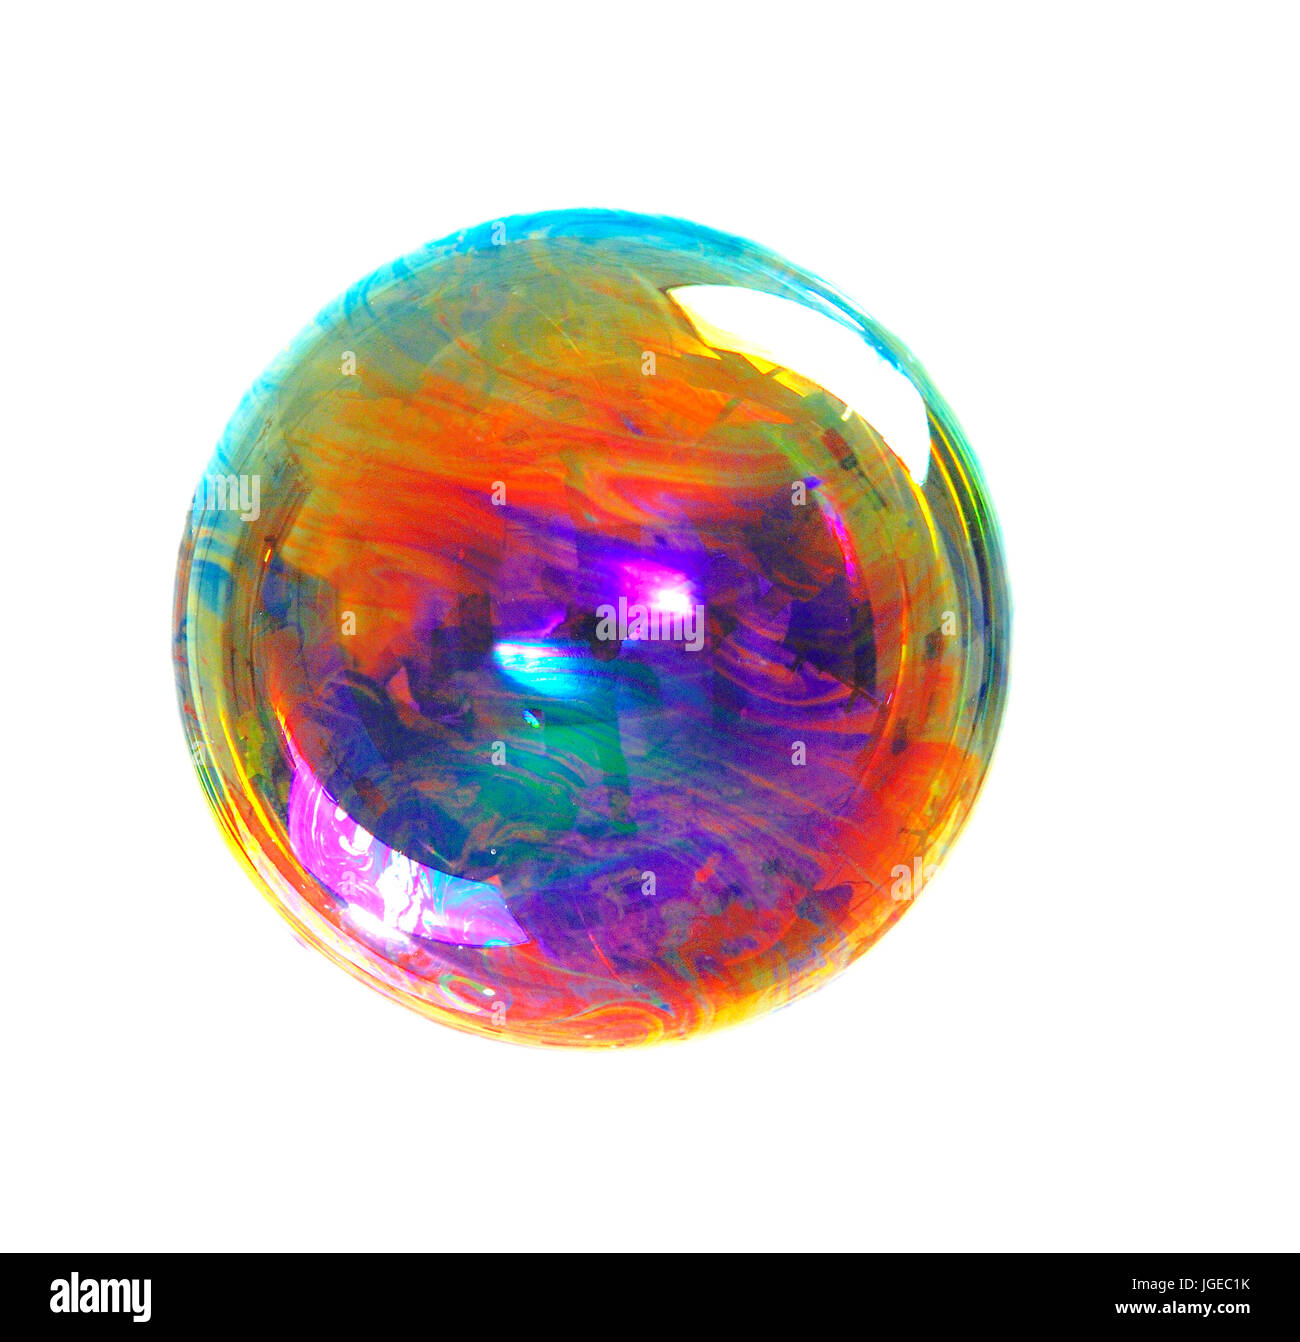 soap bubble isolated on white - Stock Image